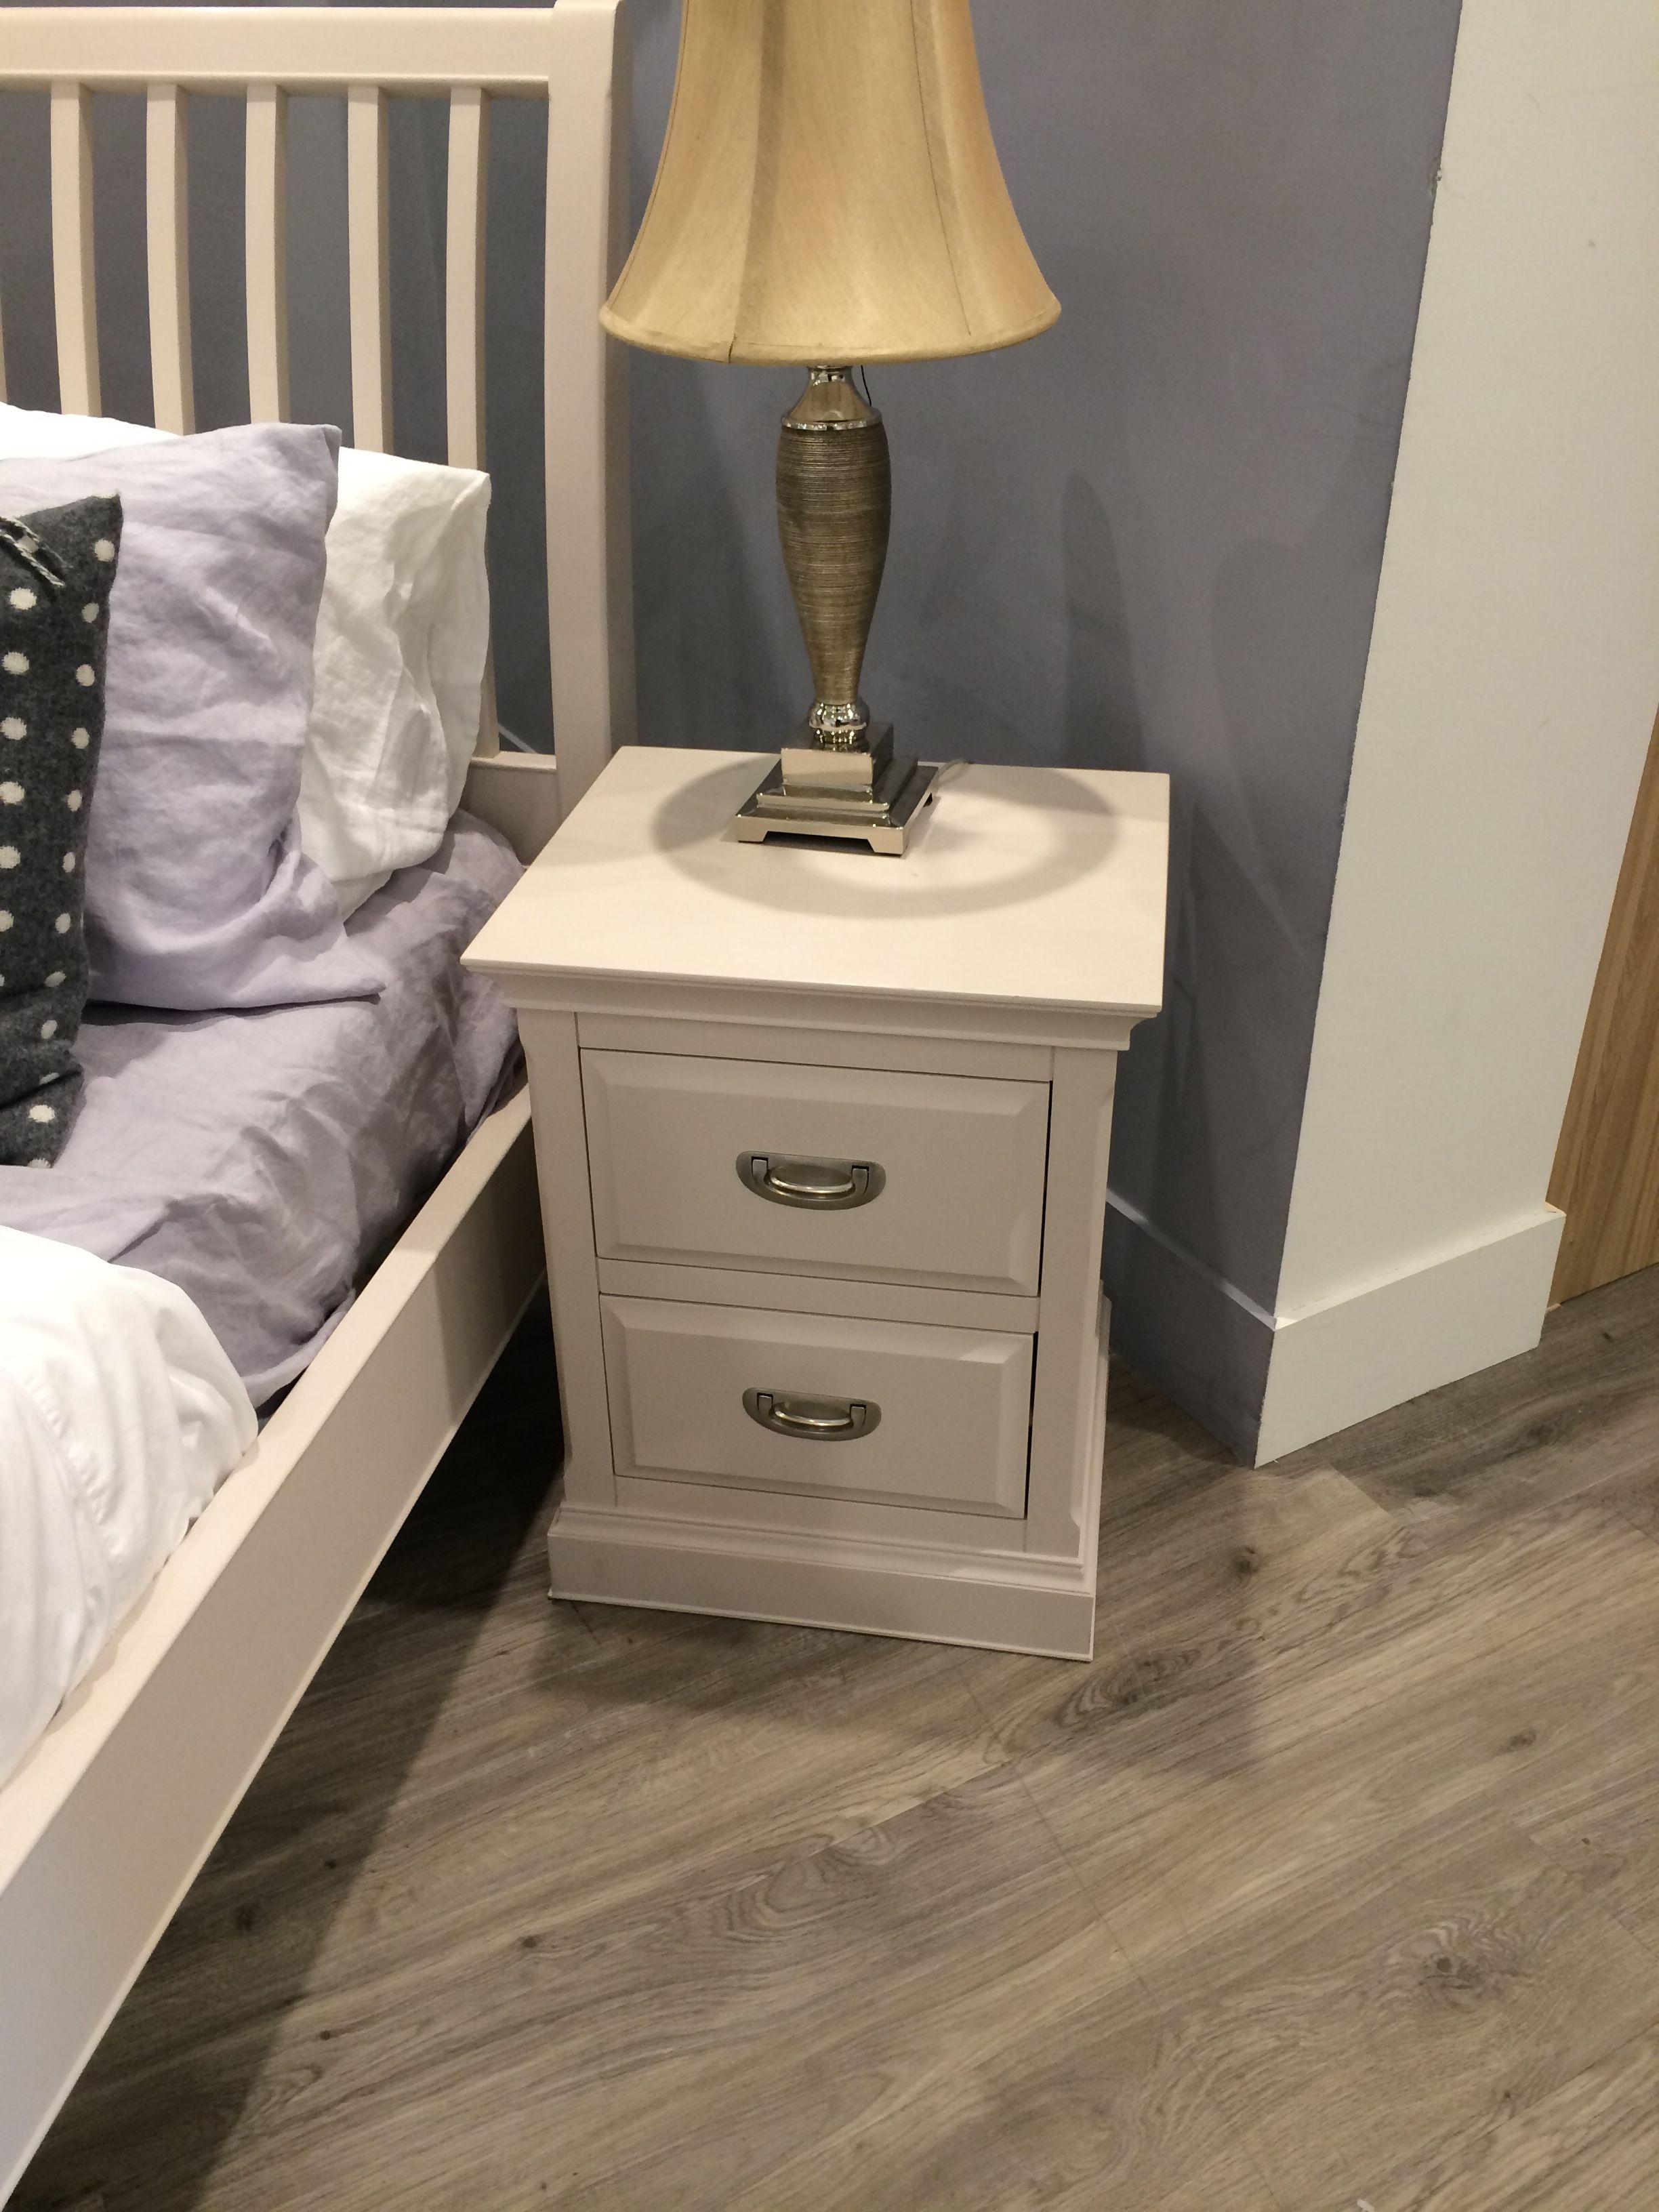 Best Arnotts Bedside Locker Bedside Lockers Home Decor Furniture 640 x 480